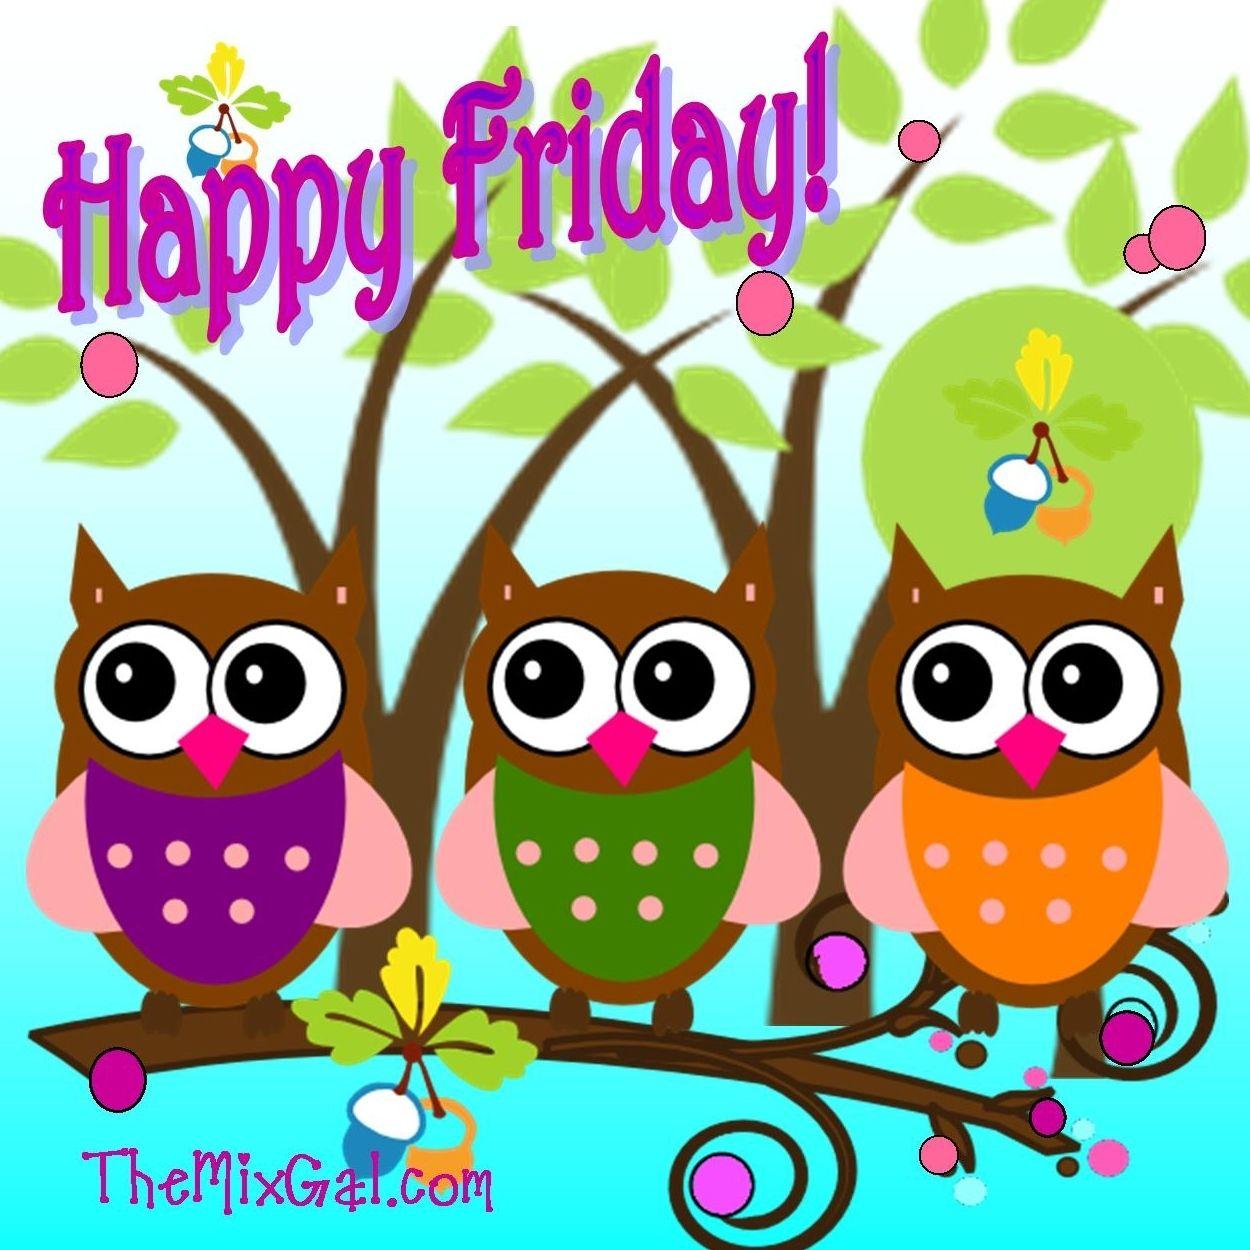 Happy Friday Bilder